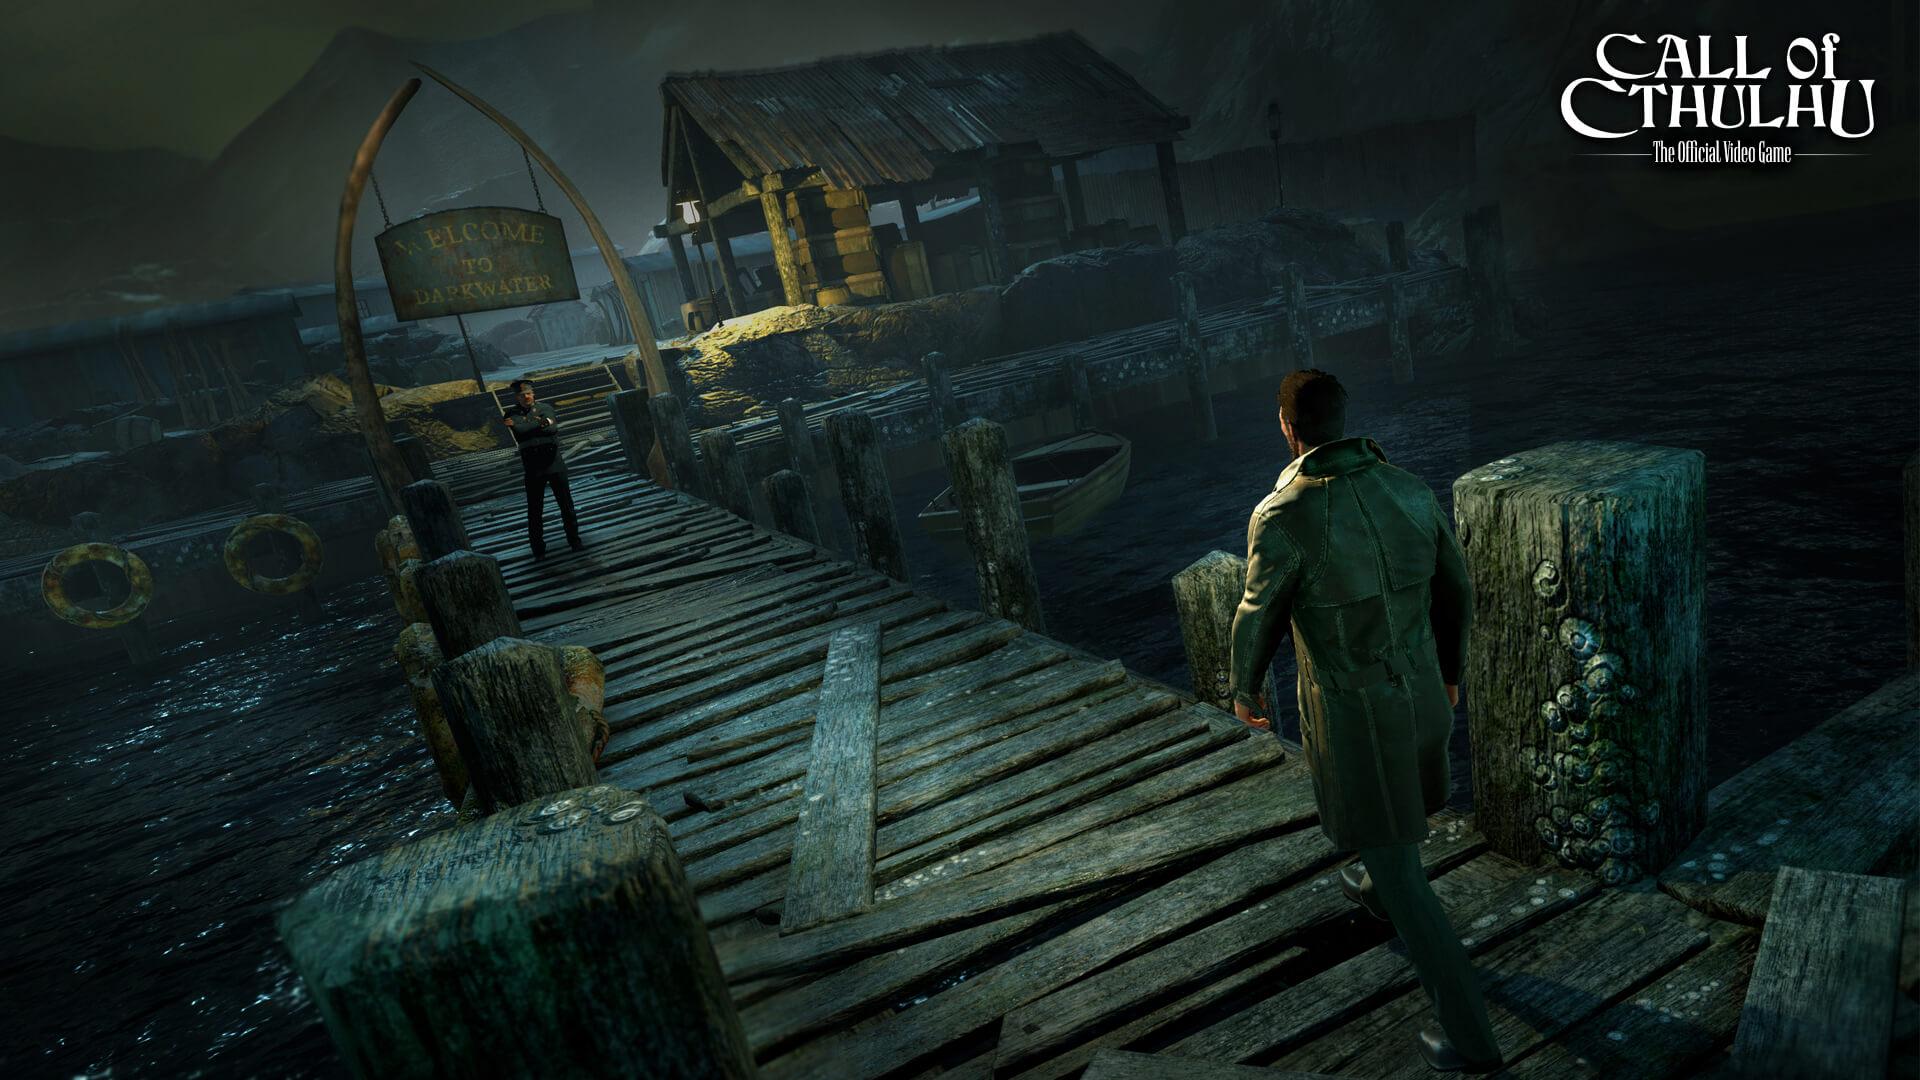 Call of Cthulhu debuts Trailer at E3